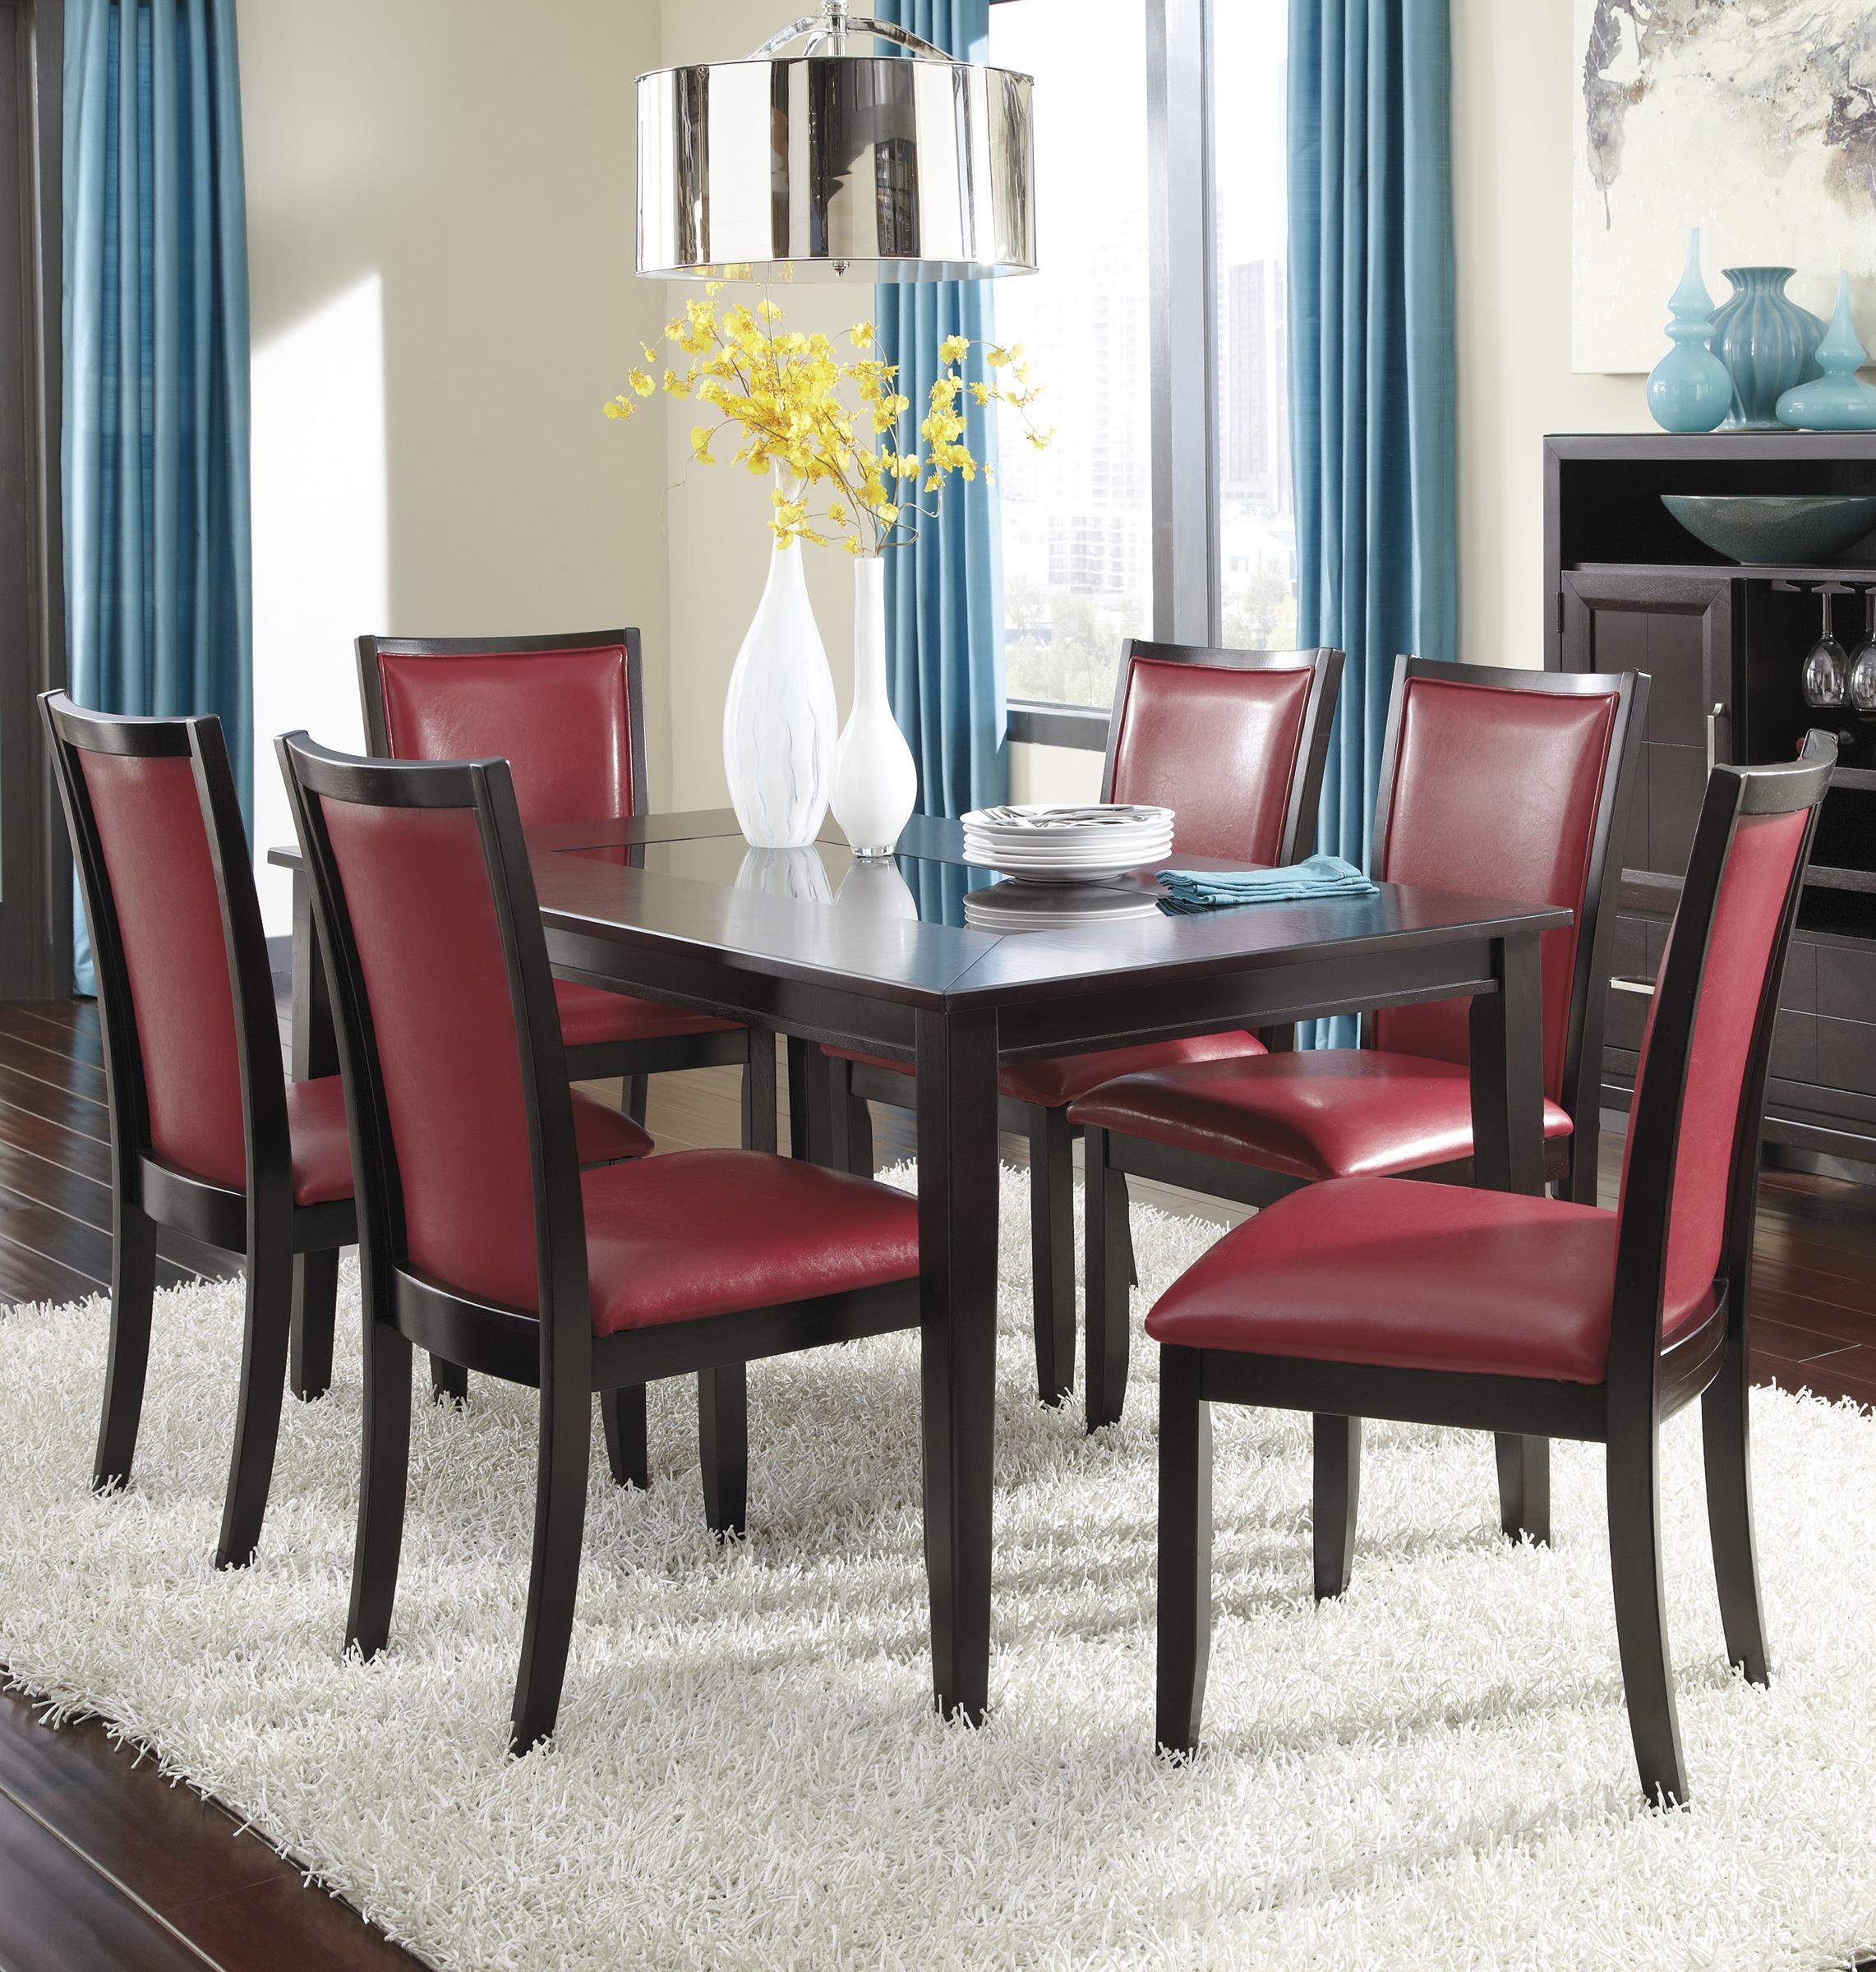 Ashley Furniture Trishelle 7-Piece Rectangular Dining Table Set - Item Number: D550-25+6x04